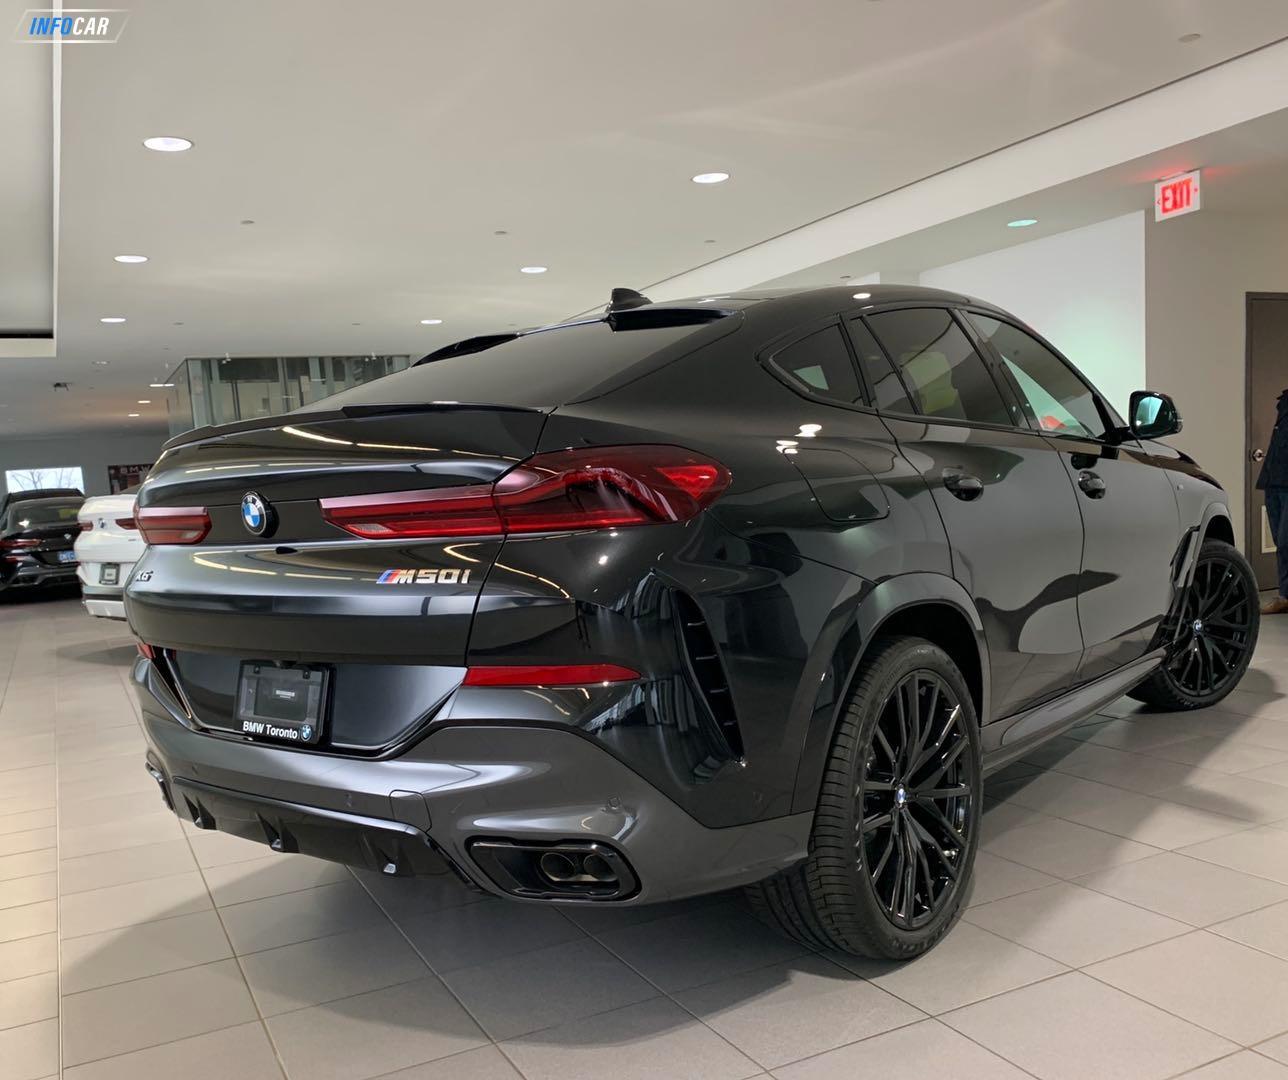 2020 BMW X6 M50i (含5400押金) - INFOCAR - Toronto's Most Comprehensive New and Used Auto Trading Platform